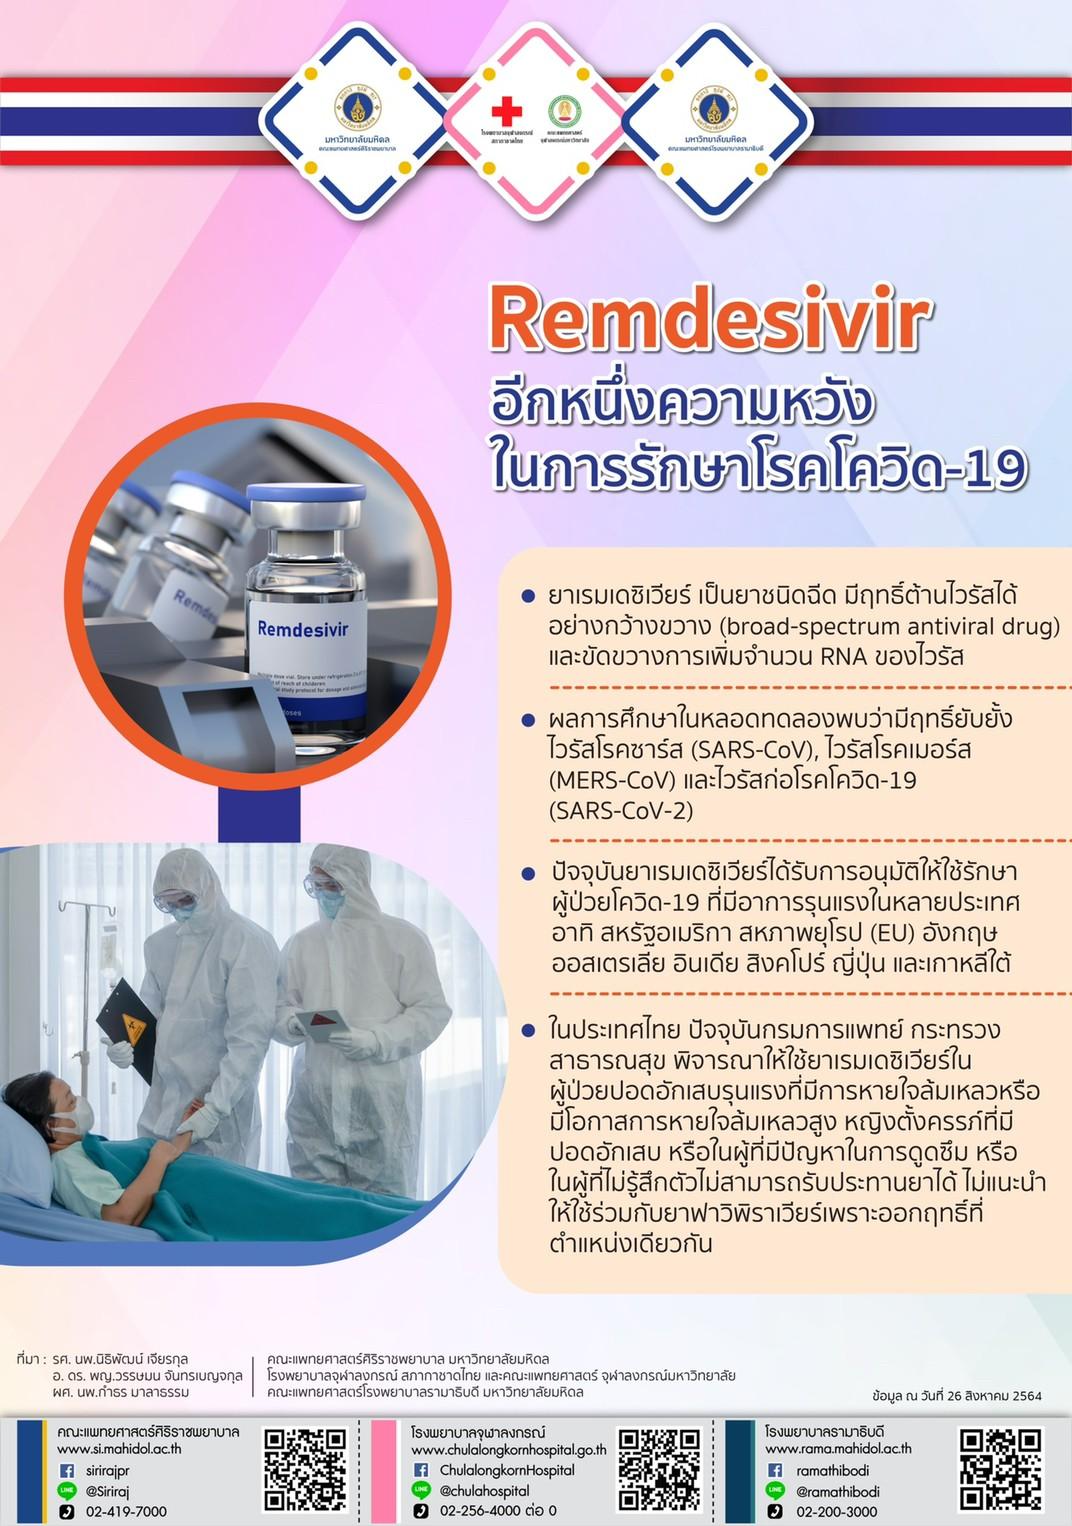 Remdesivir อีกหนึ่งความหวังในการรักษาโรคโควิด-19